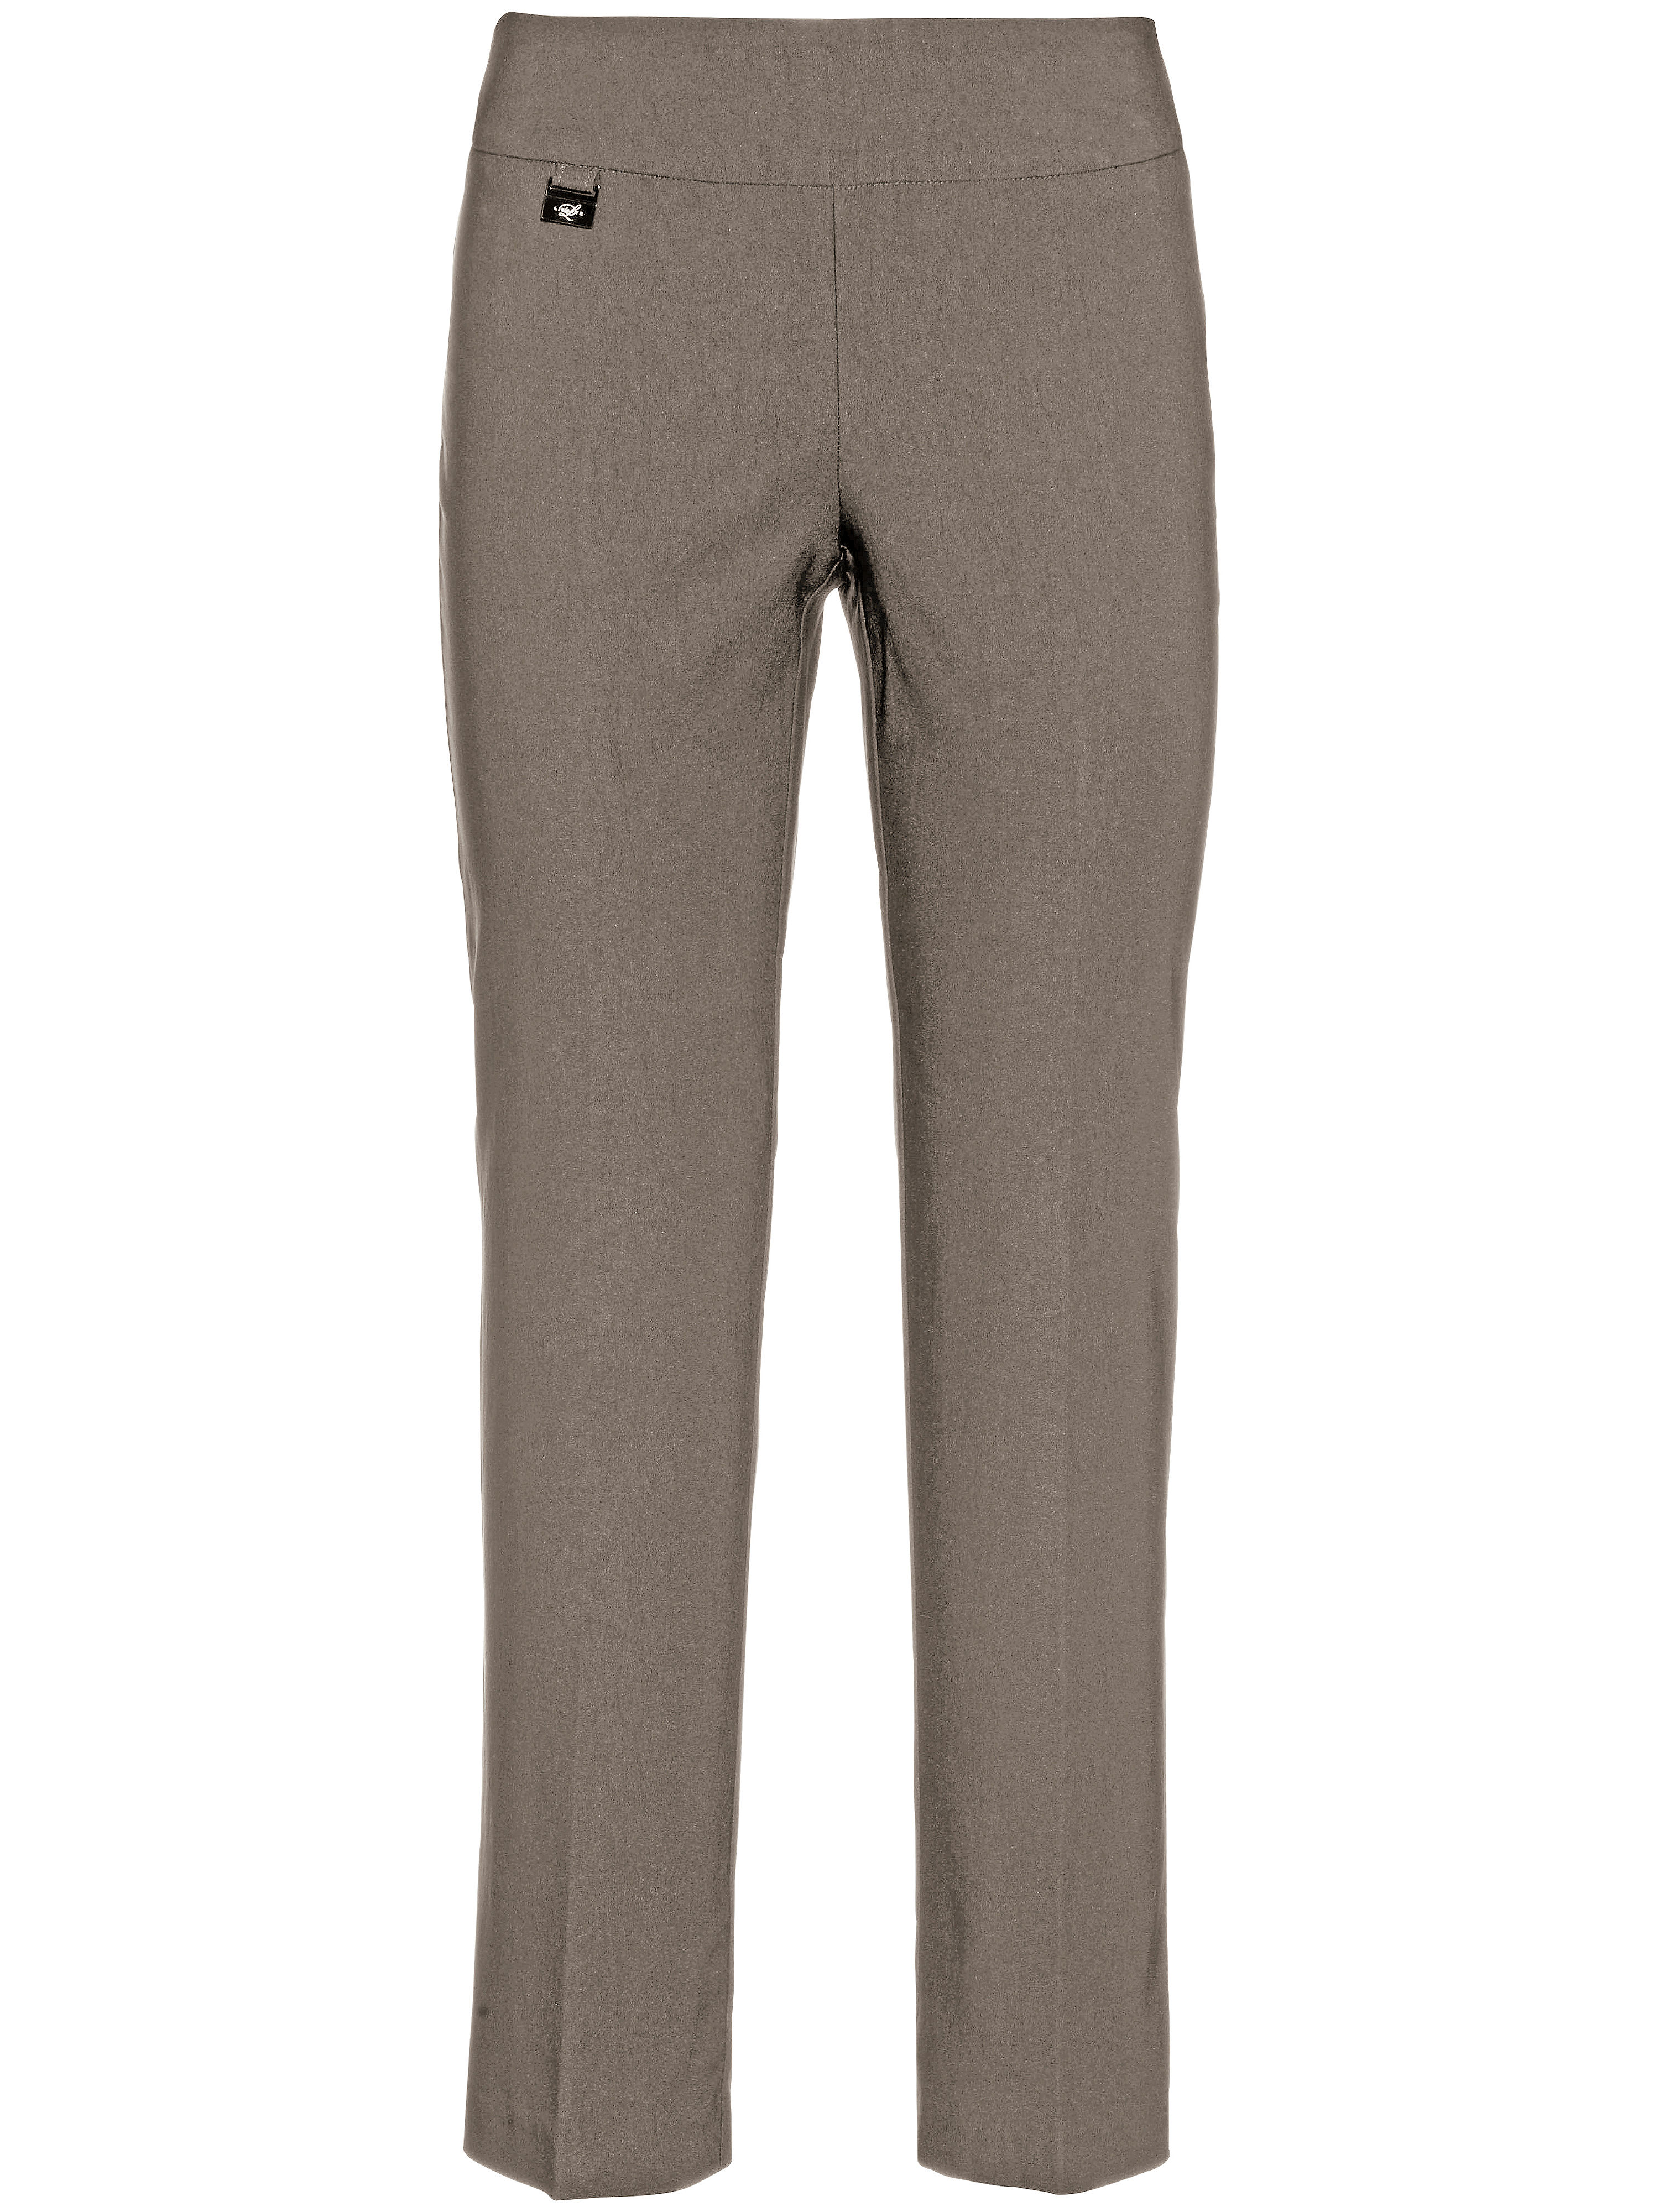 Le pantalon 7/8 modelant  Lisette L. beige